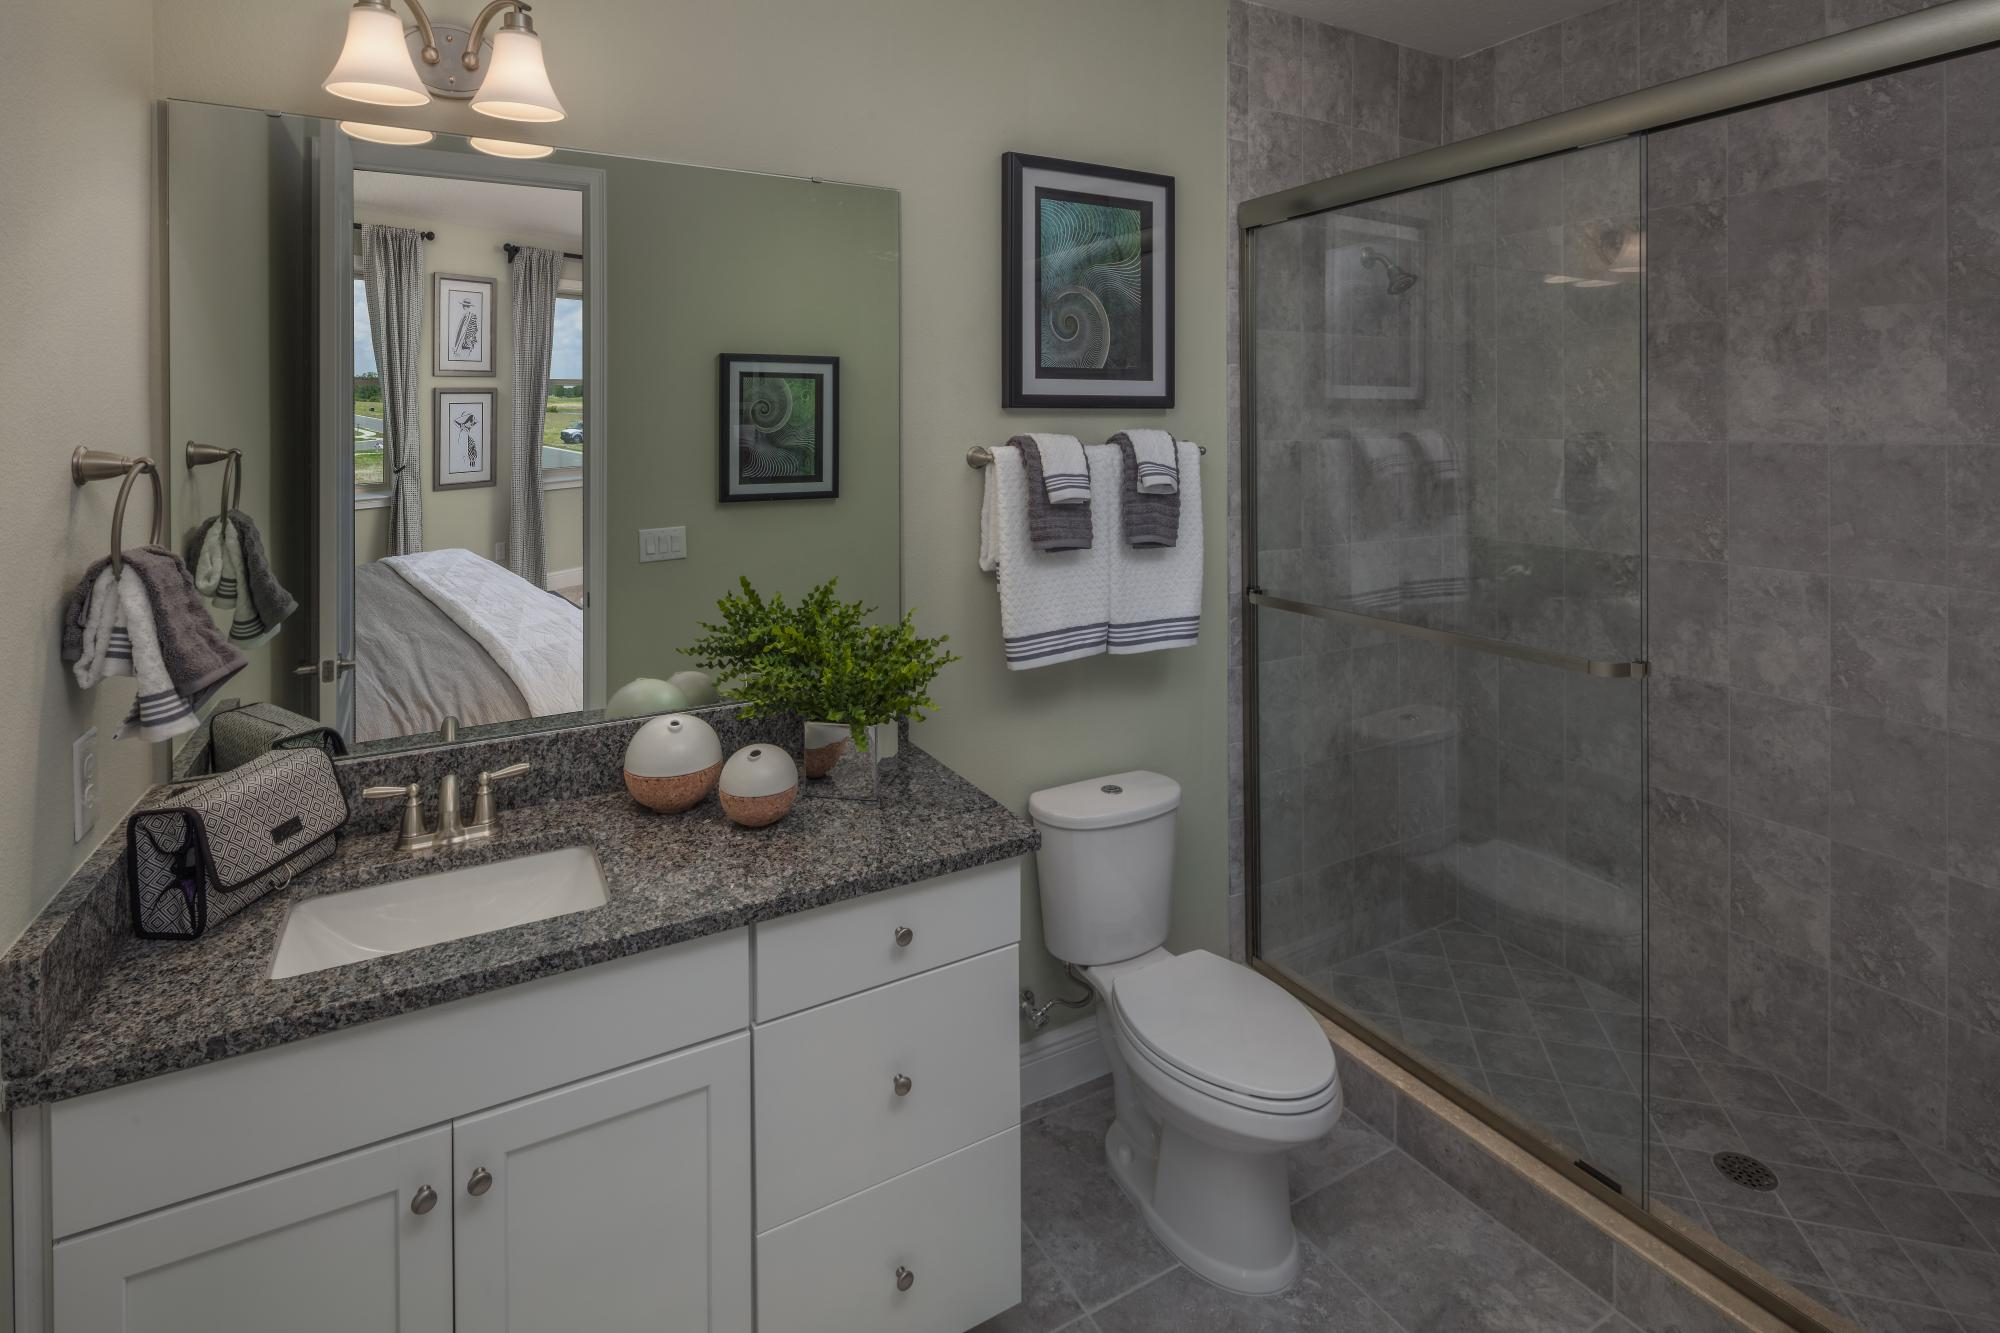 doral-bathroom.jpg